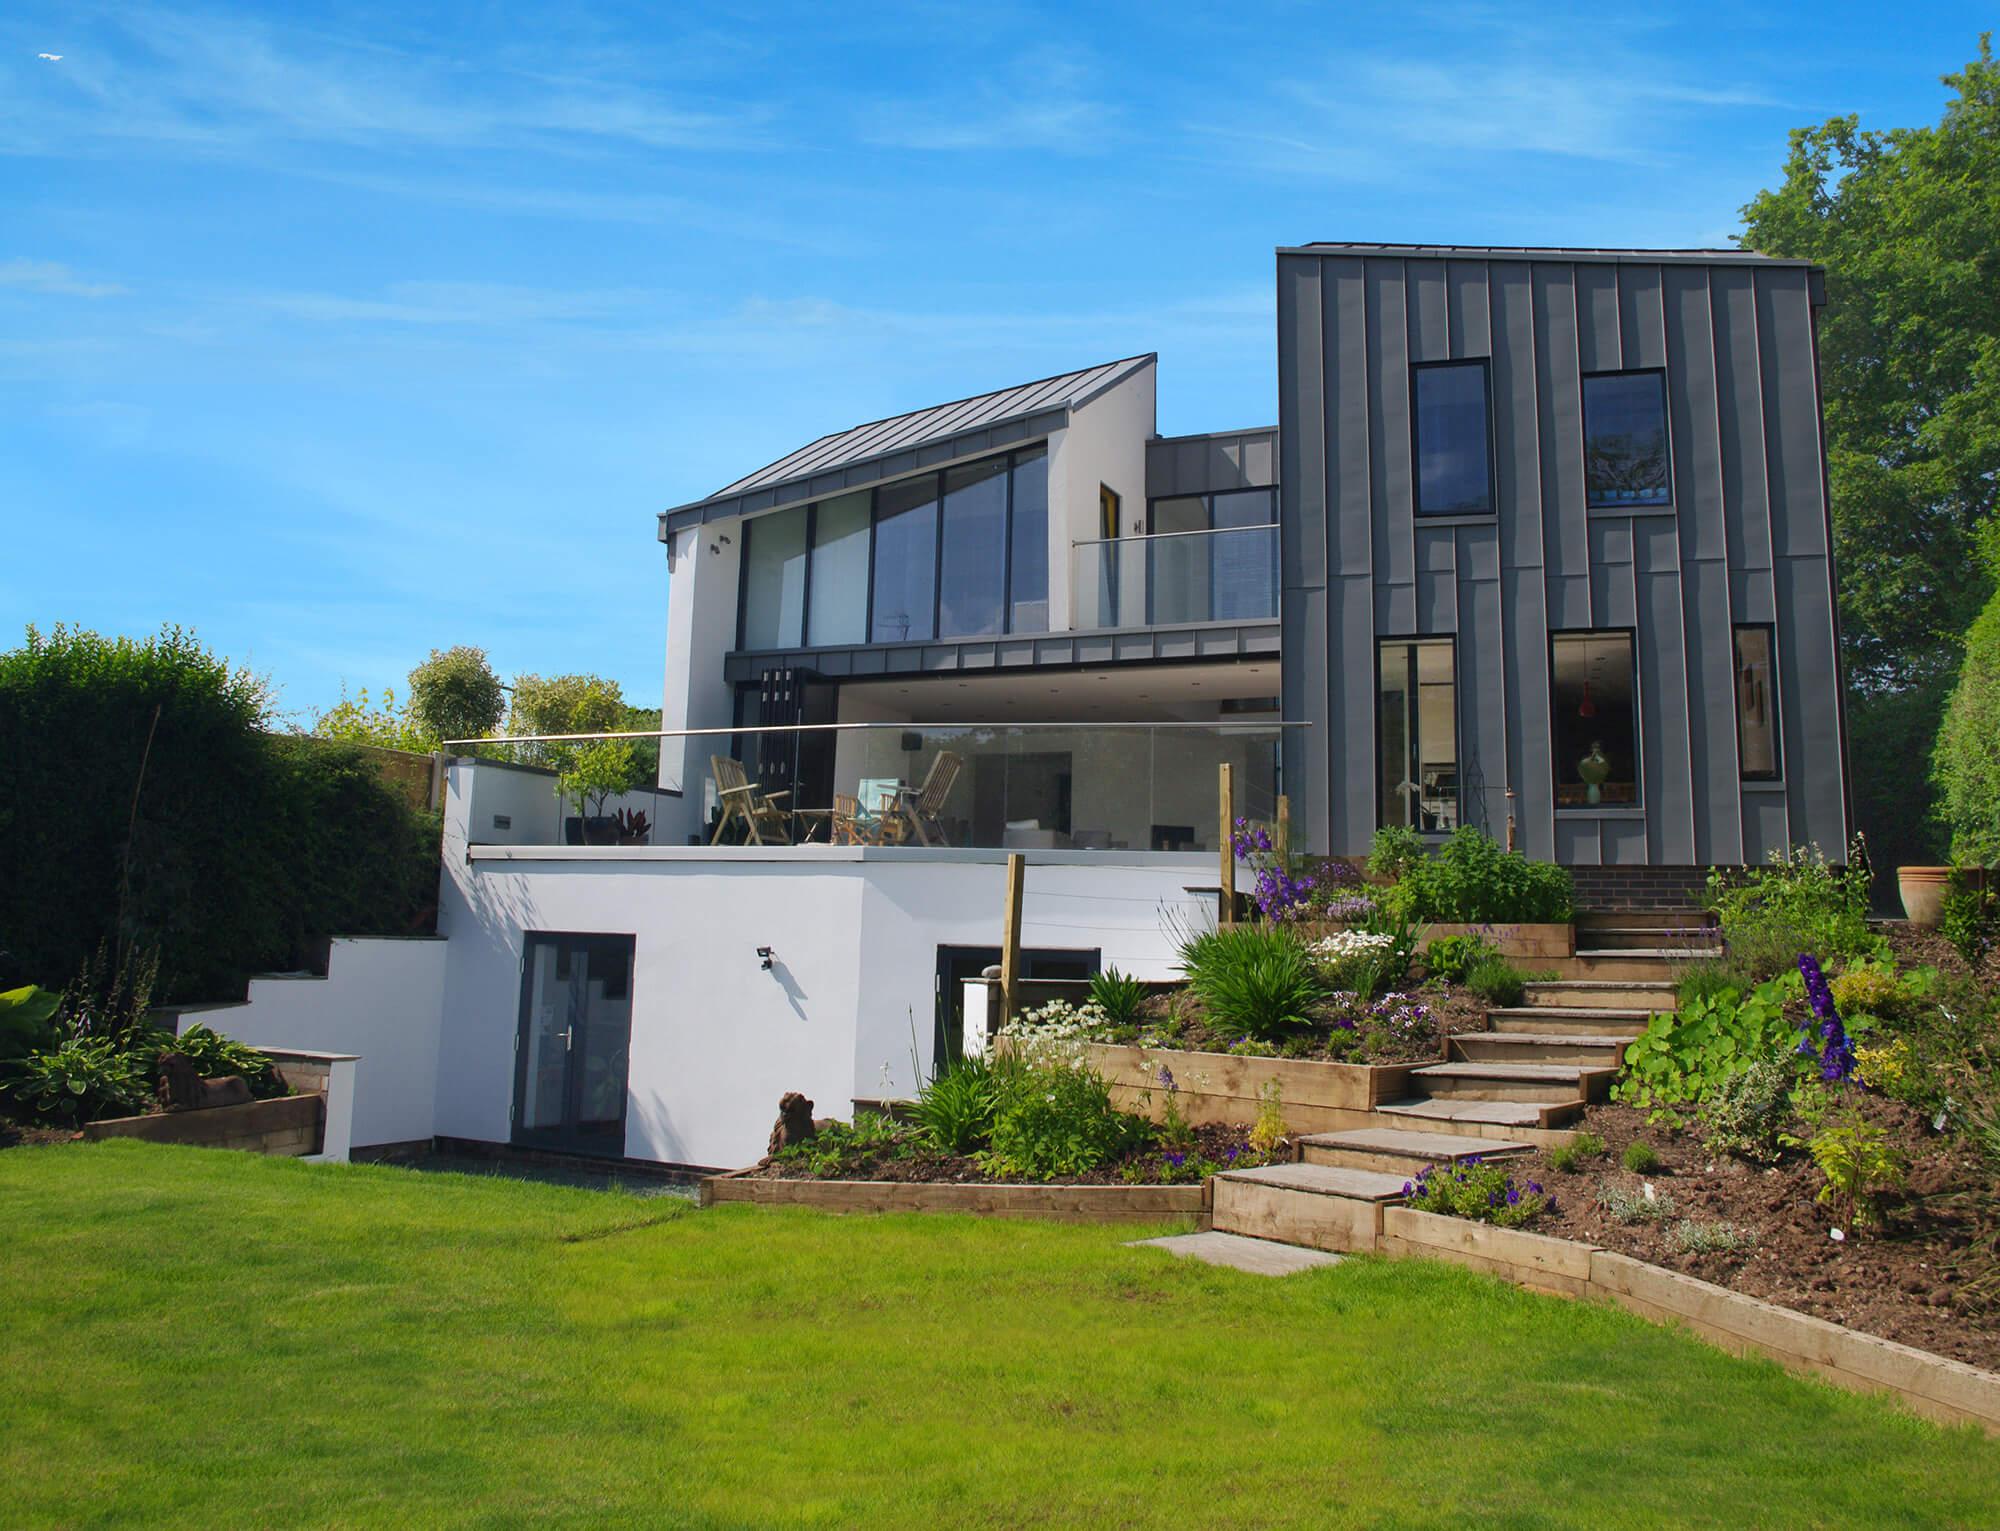 Modern Home Clad in Zinc